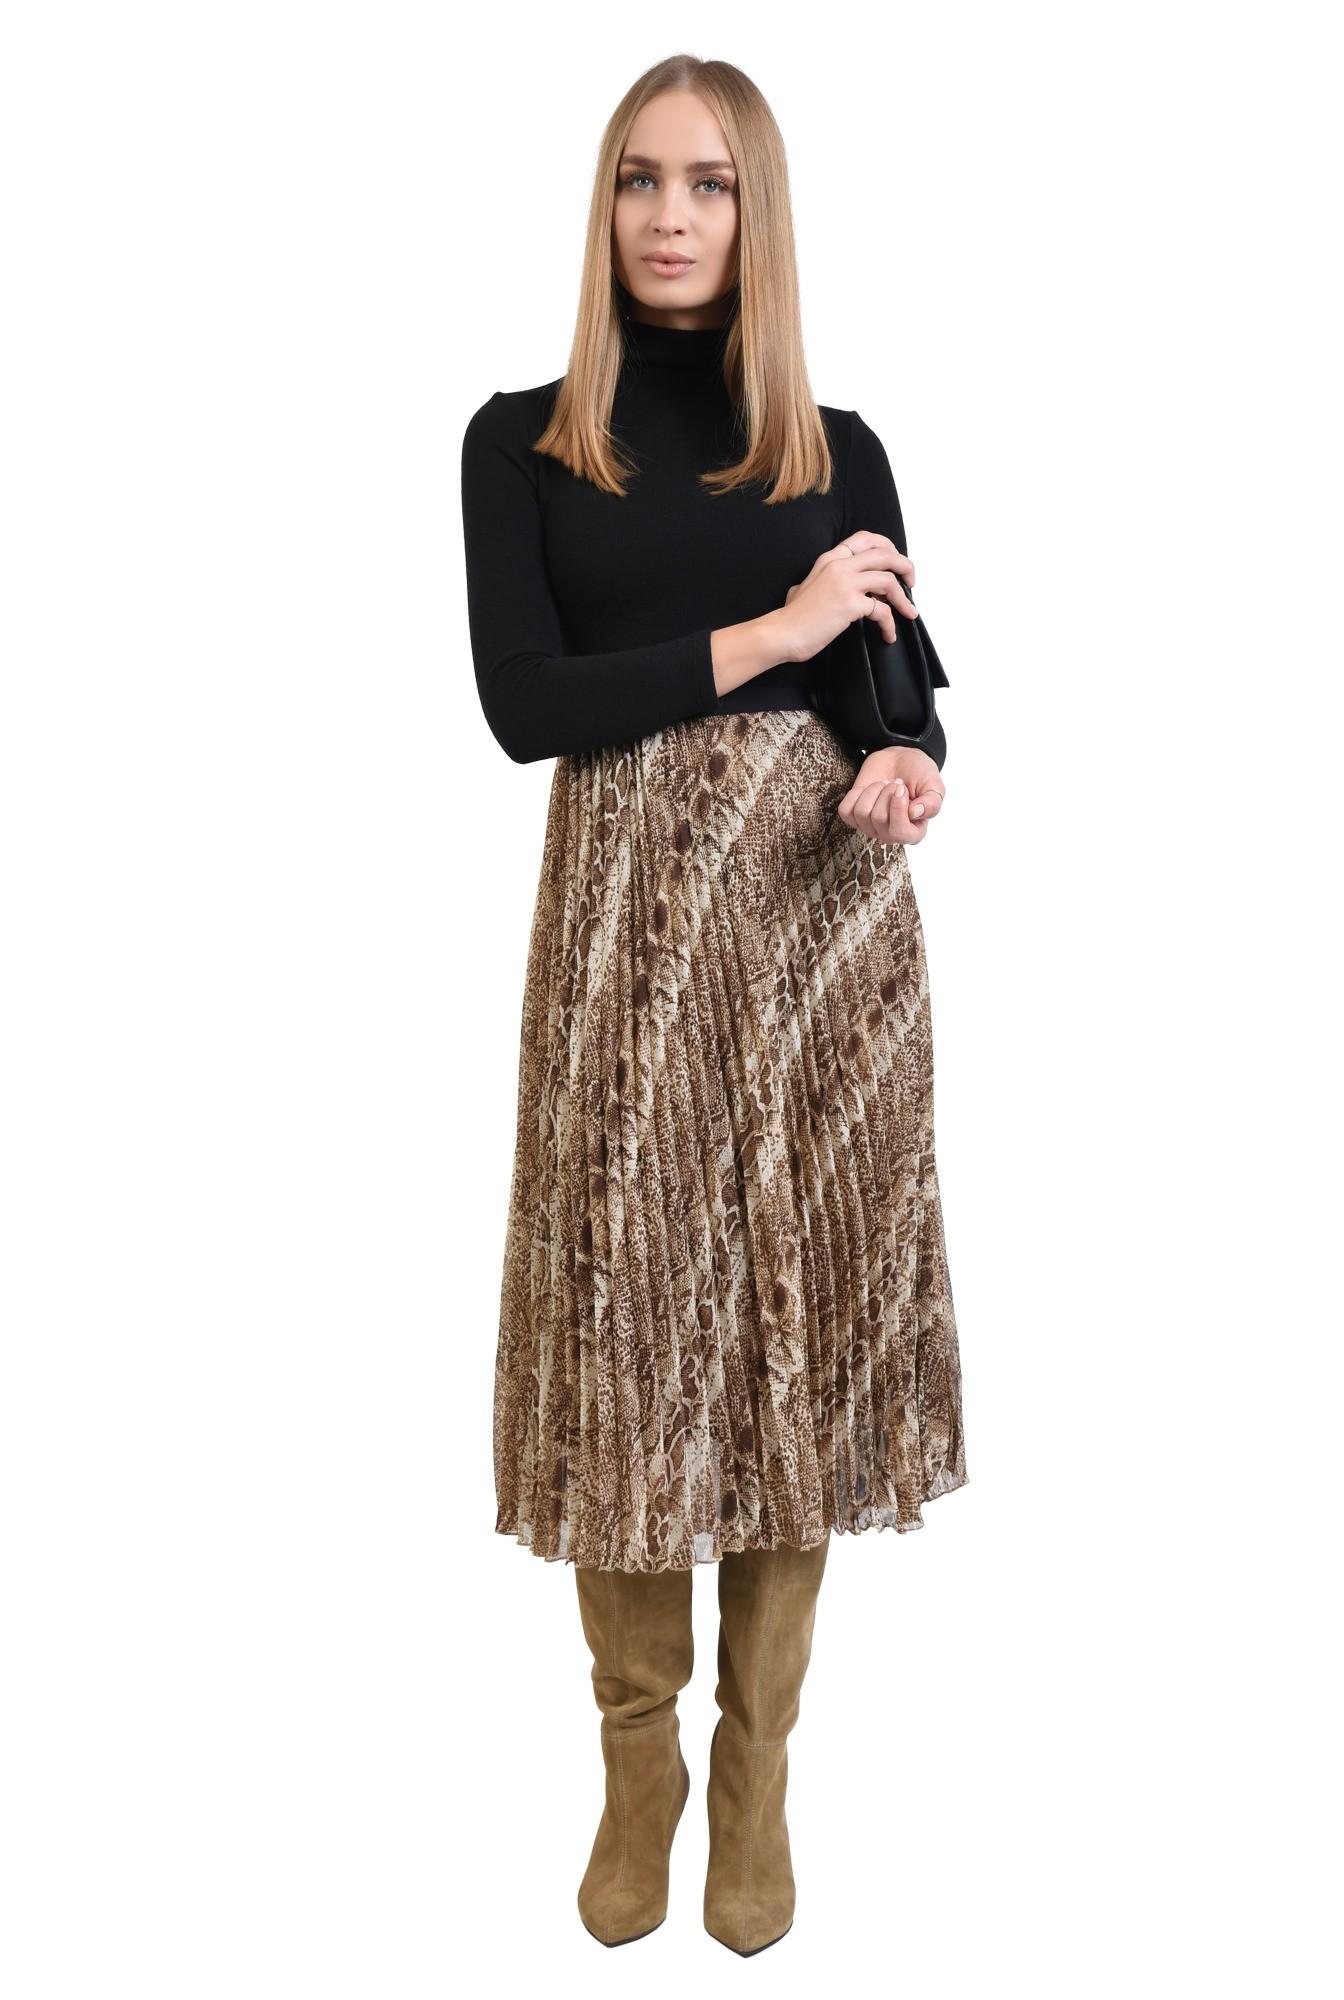 0 - fusta animal print, din voal, pliseuri, talie inalta cu betelie elastica, print